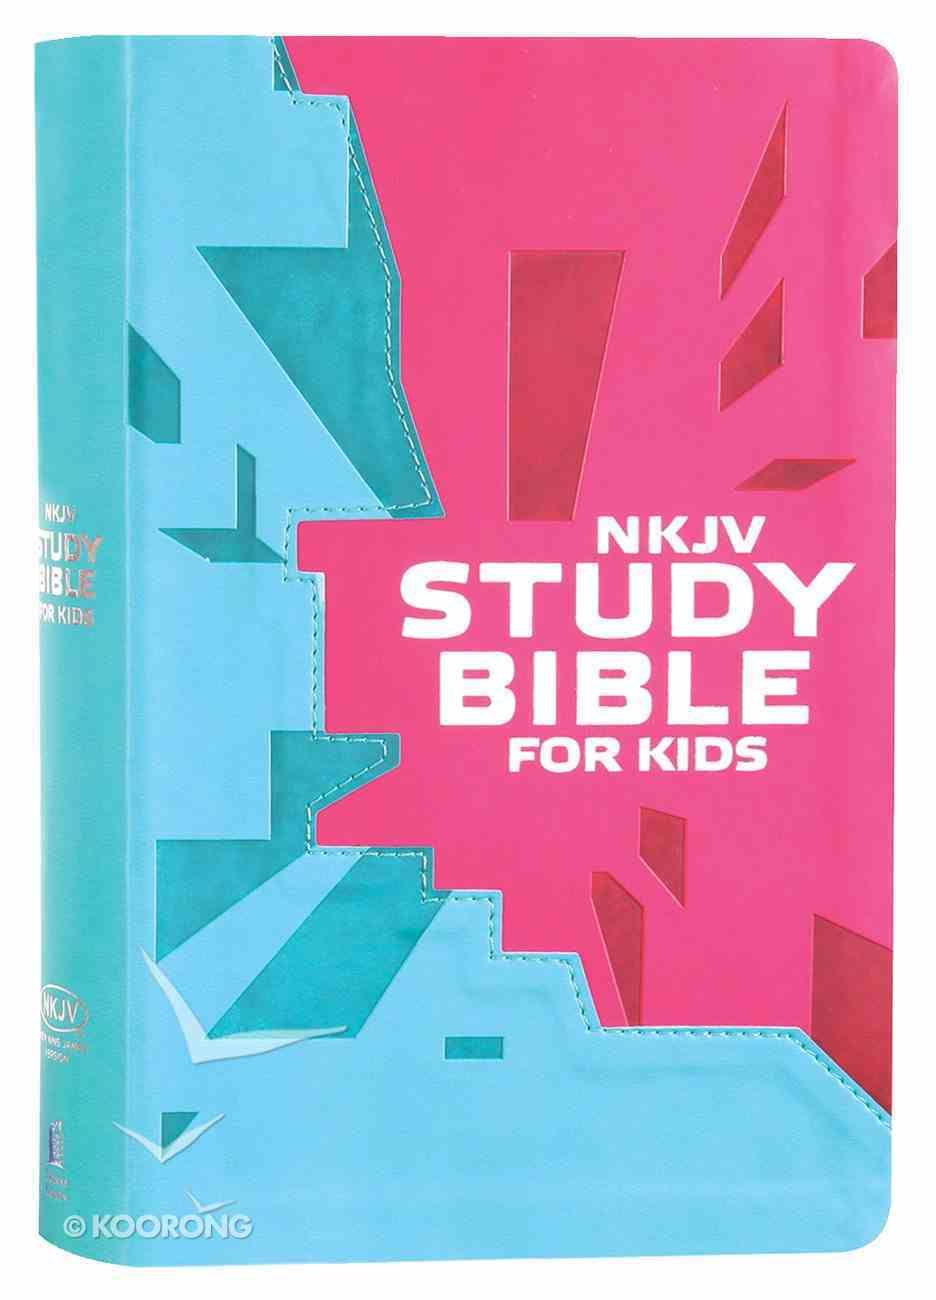 NKJV Study Bible For Kids Pink (Black Letter Edition) Premium Imitation Leather